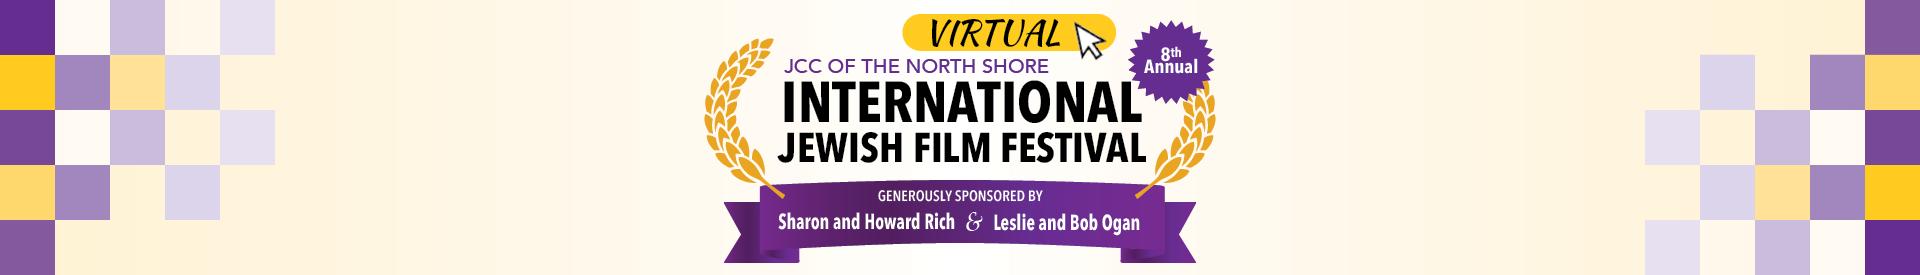 2021 JCCNS International Jewish Film Festival